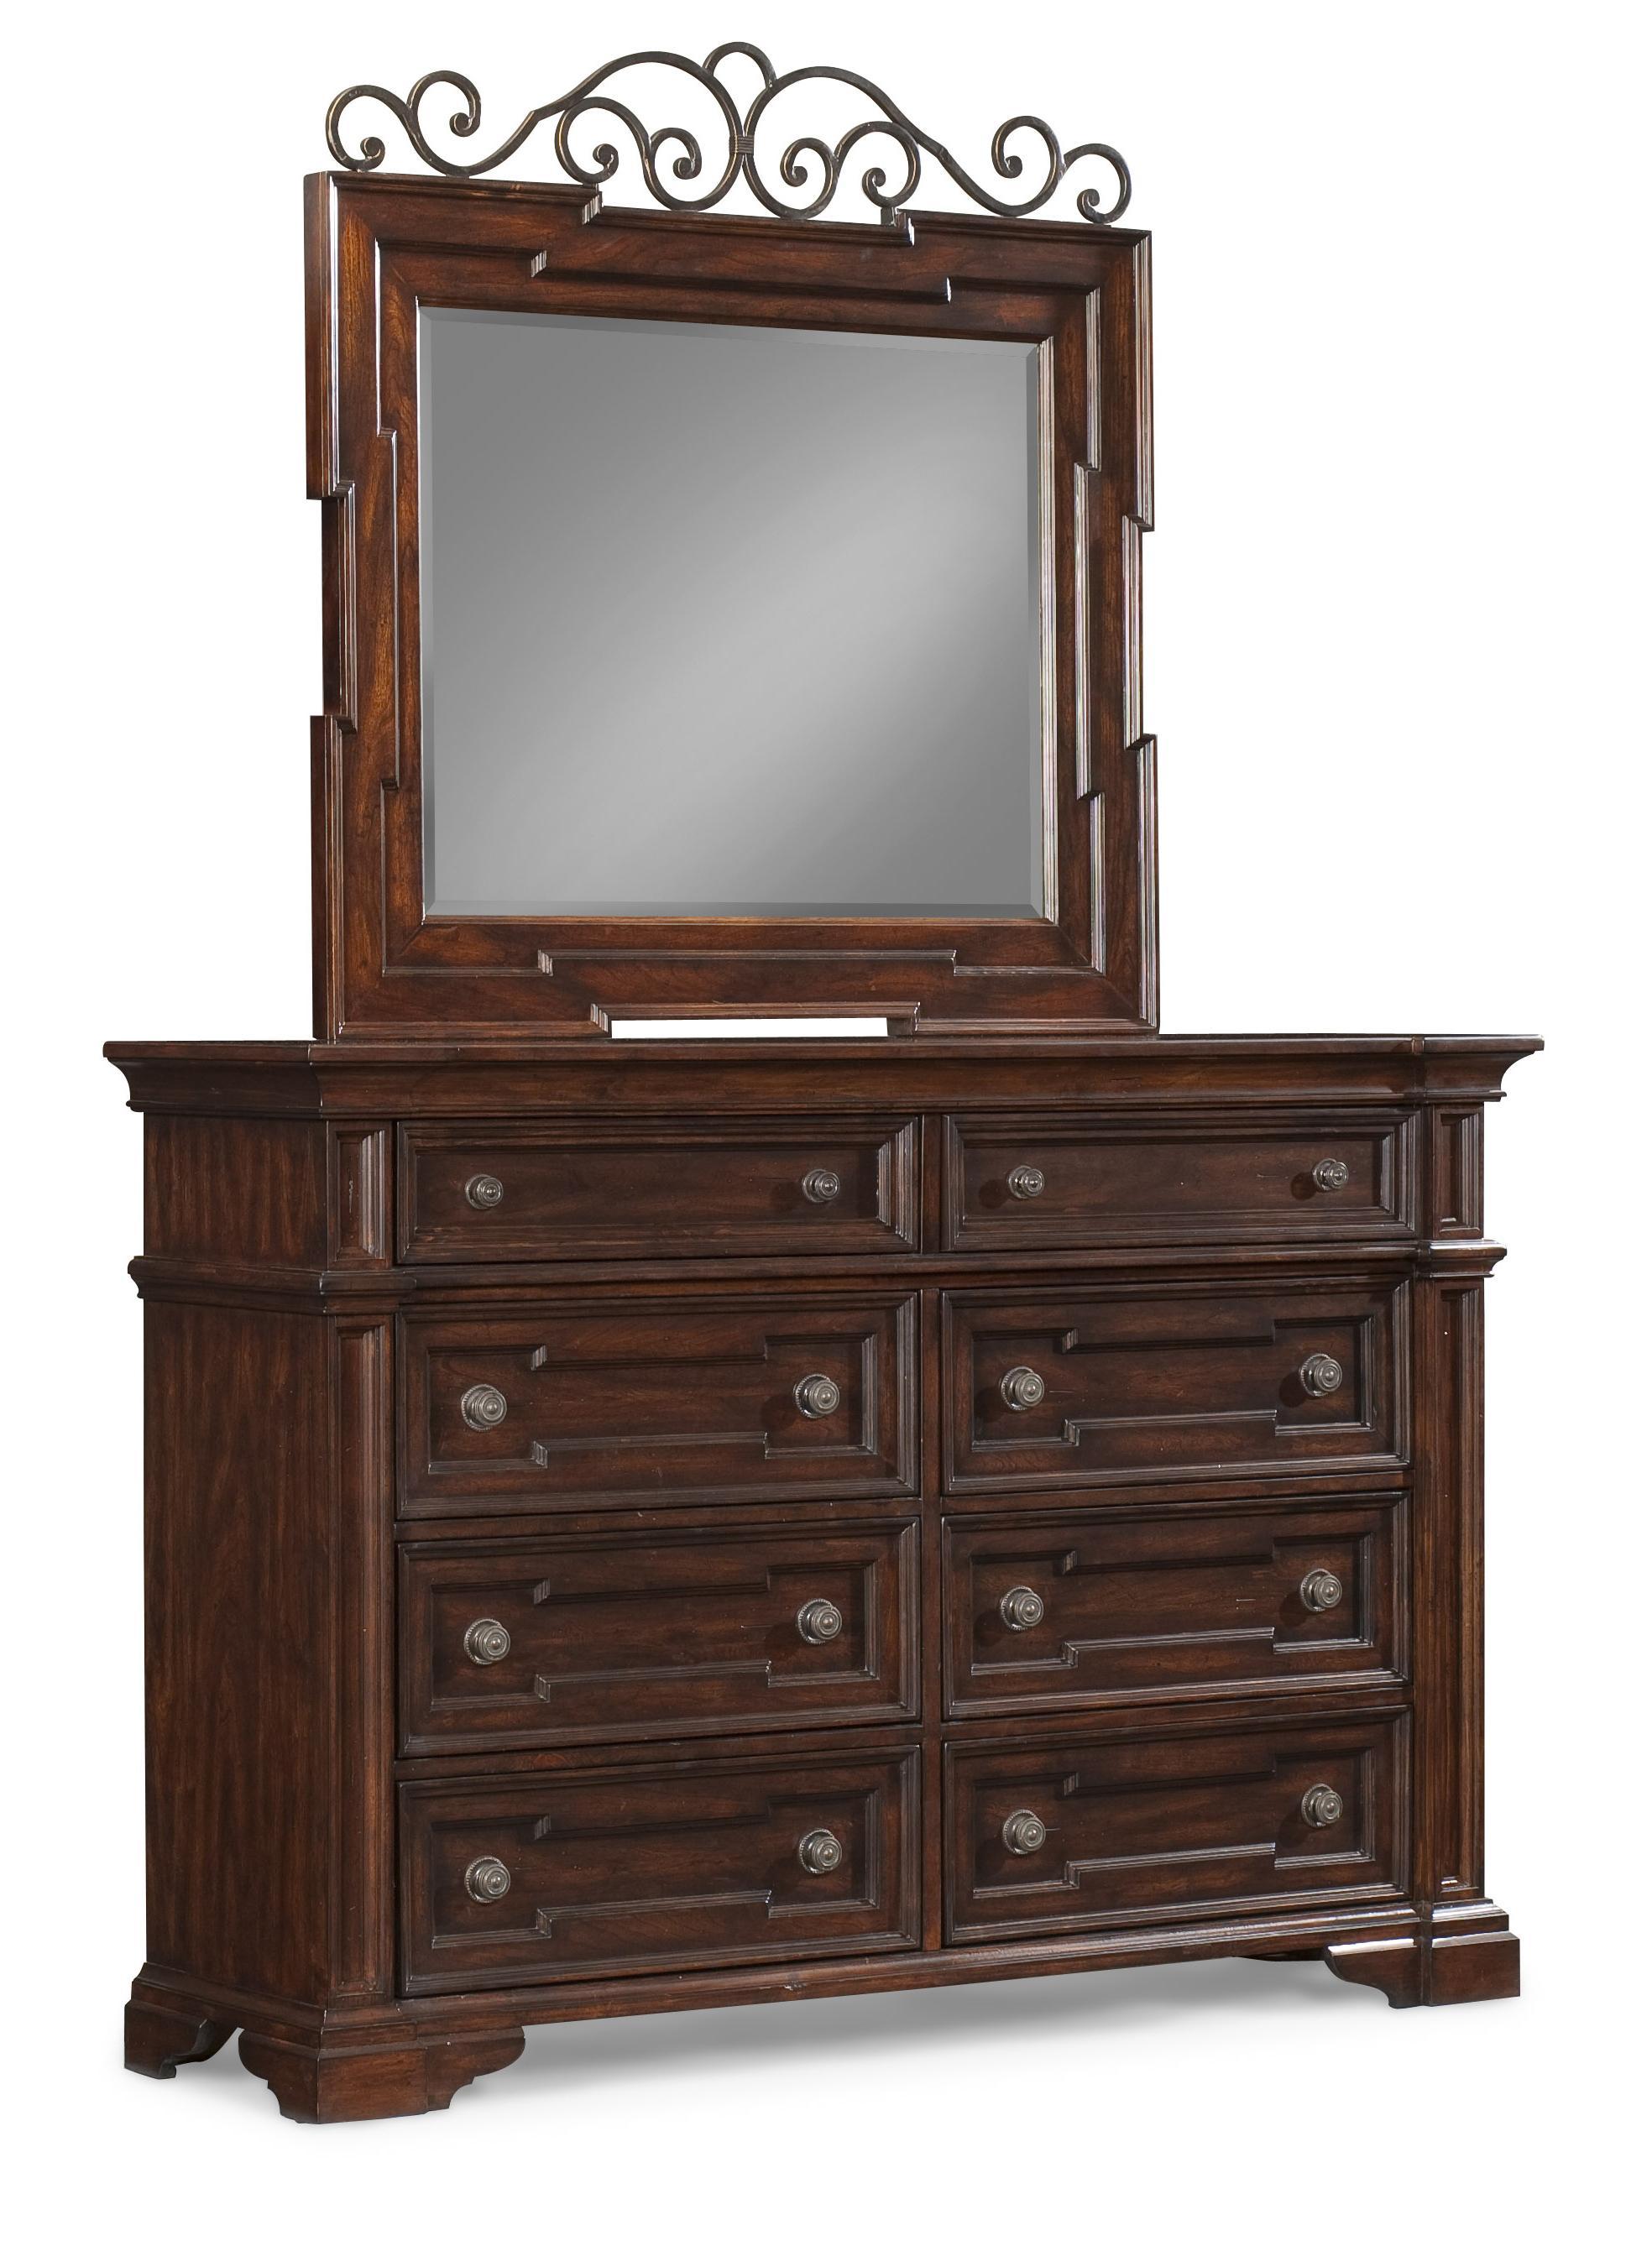 Belfort Basics Chesterbrook Dresser and Mirror Set - Item Number: 872-650 DRES+660 MIRR